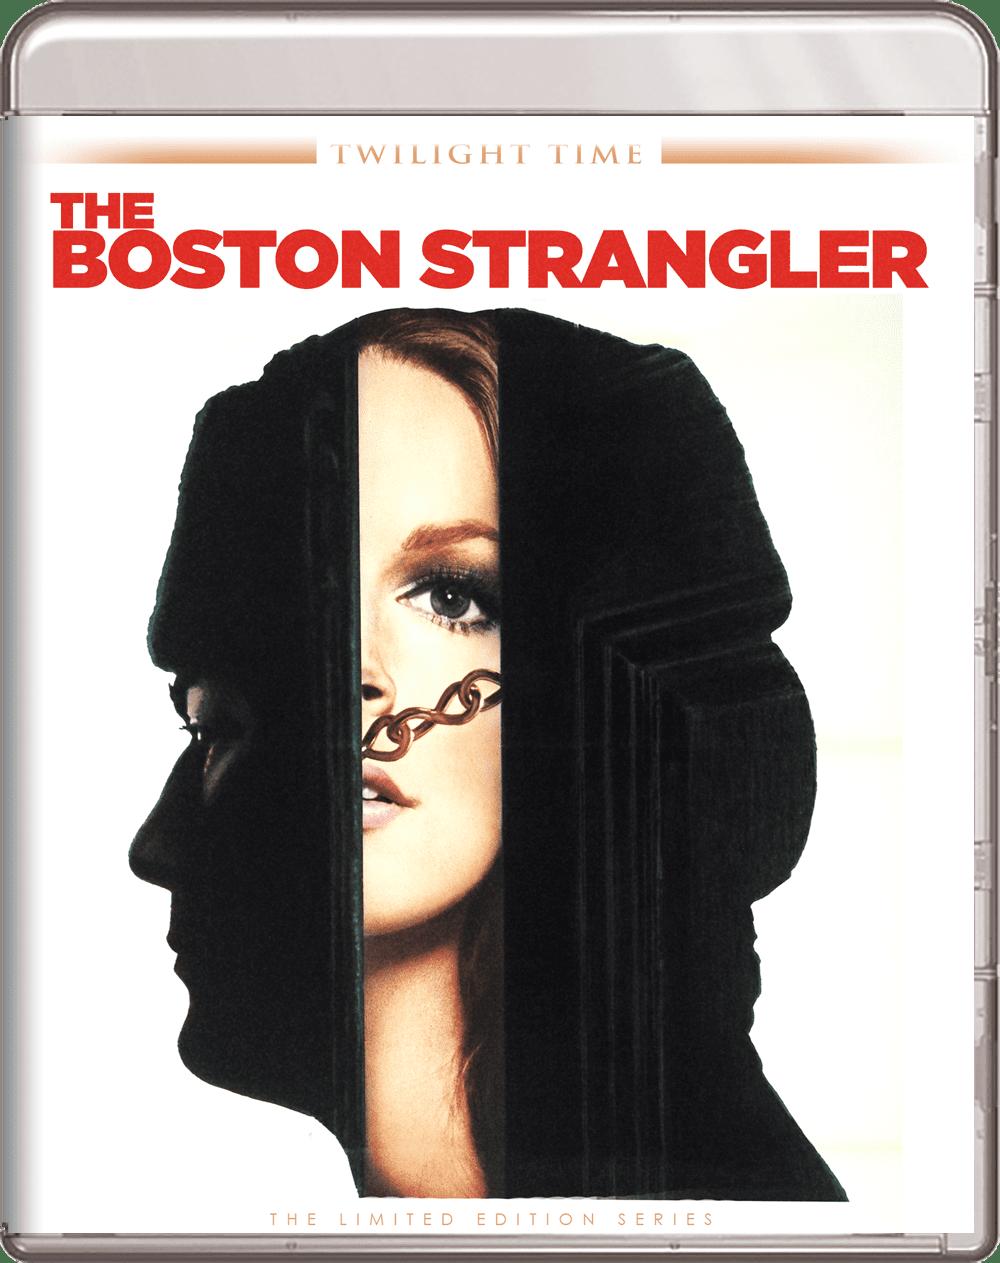 Download The Boston Strangler 1968 REMASTERED PROPER BRRip